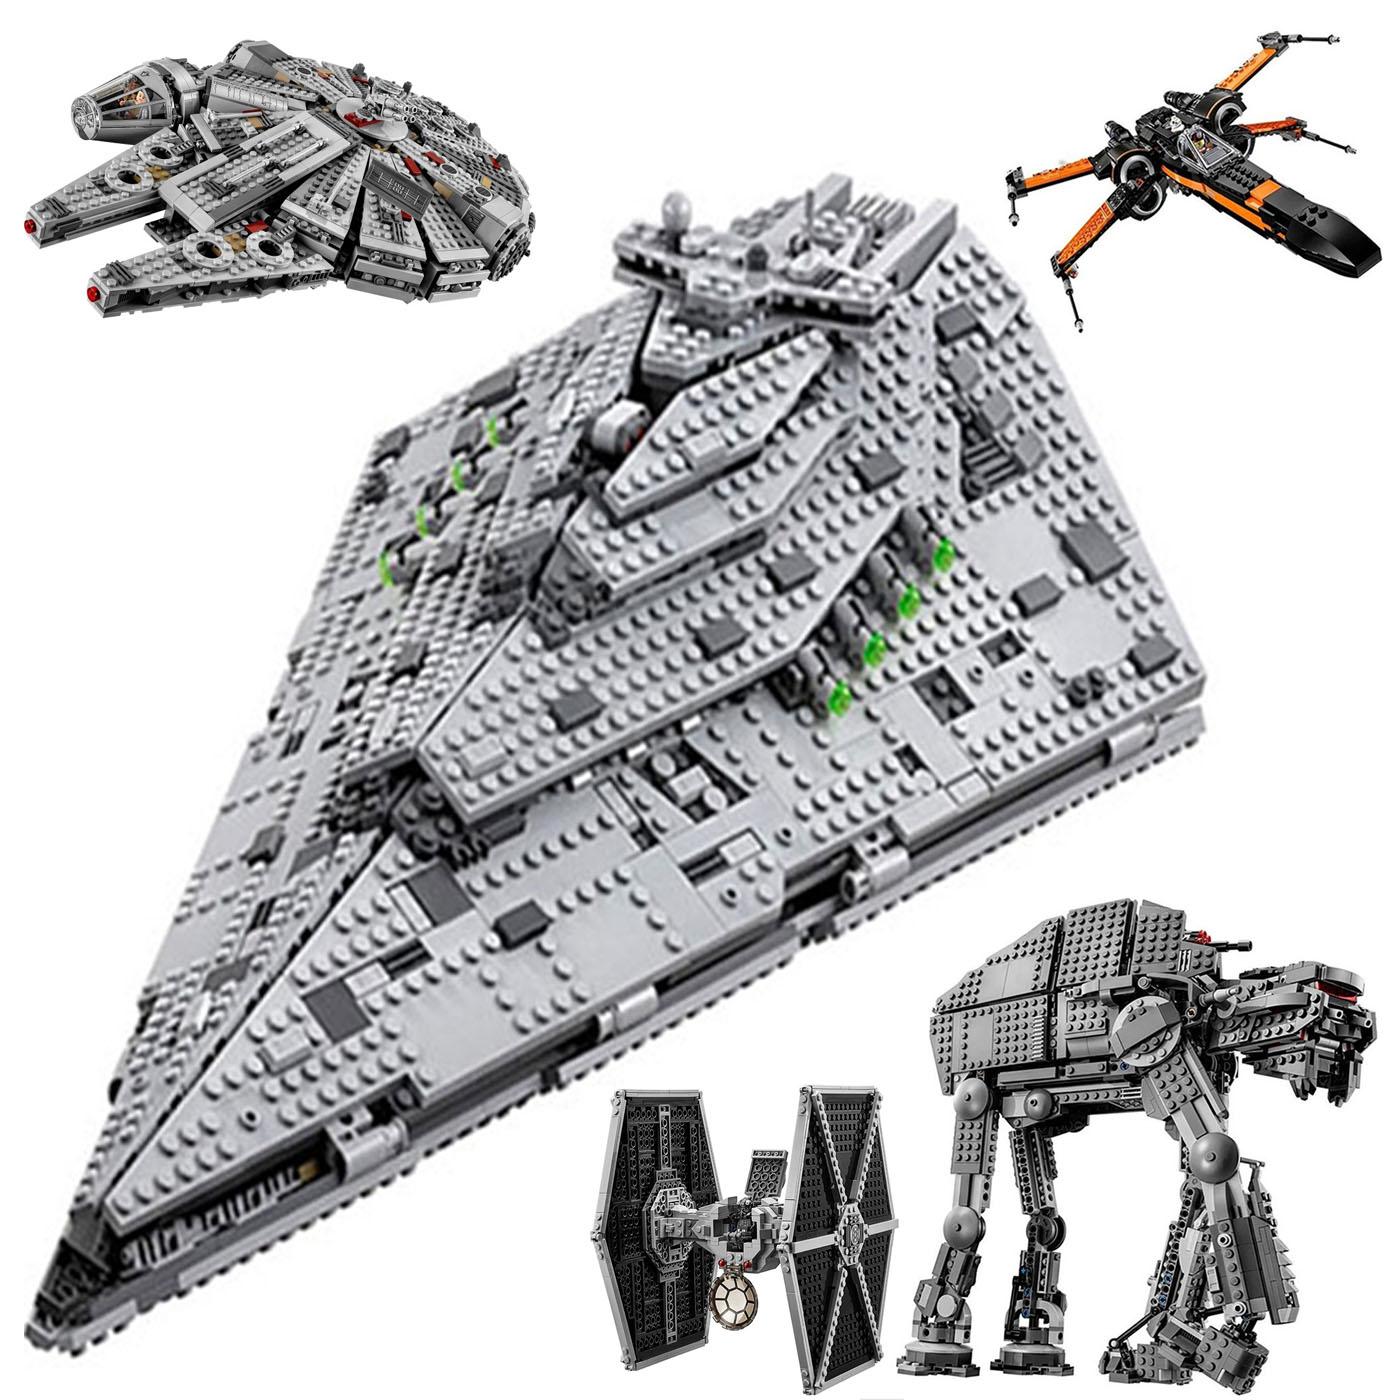 2020-new-10901-hot-first-order-star-destroyer-costruzion-model-1457pcs-compatible-lepining-font-b-starwars-b-font-building-blocks-bricks-toys